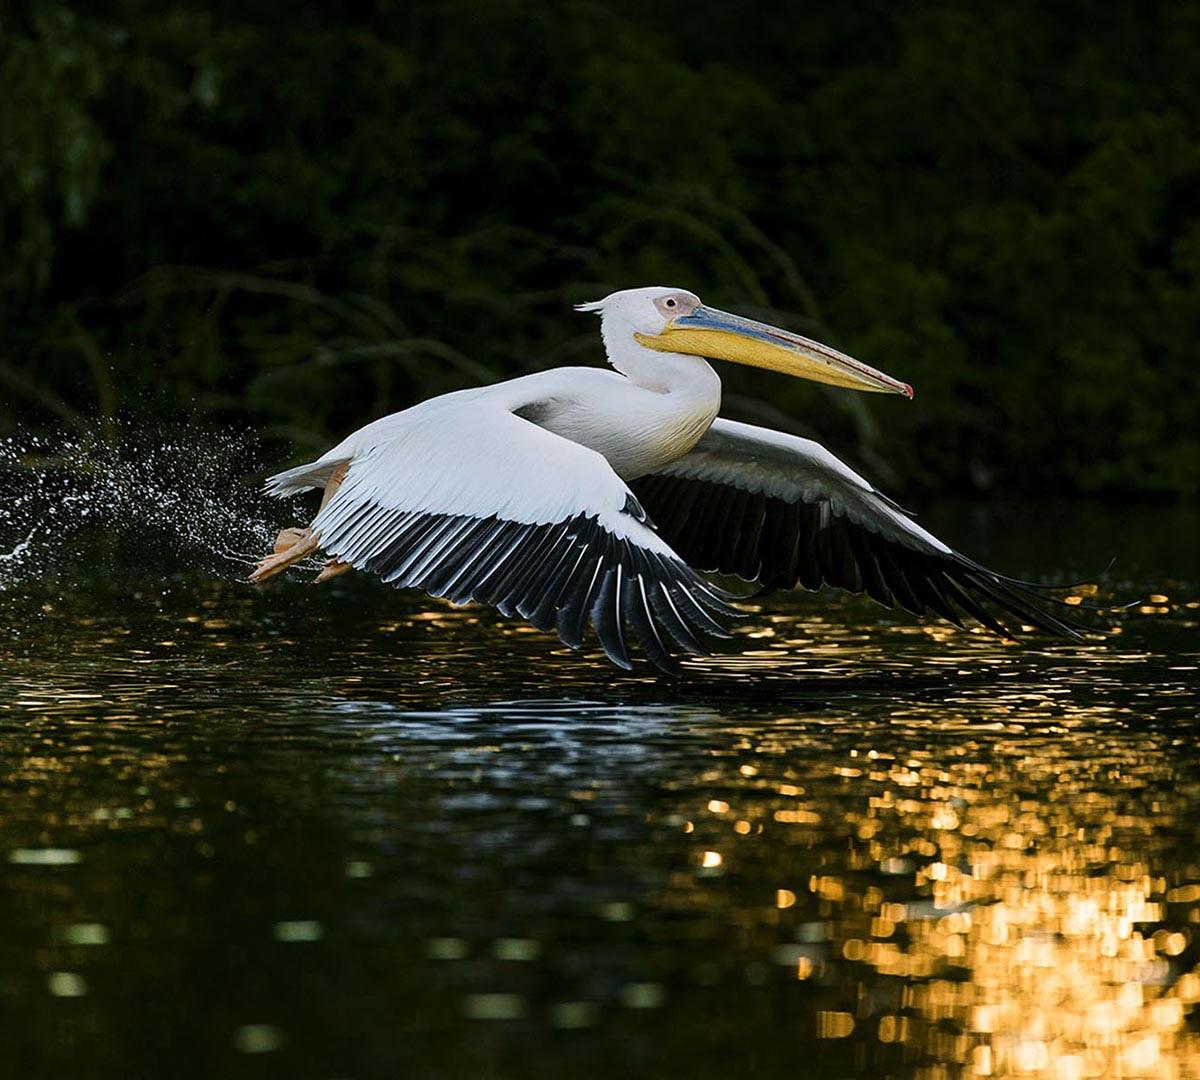 Donaudeltats Fågelliv